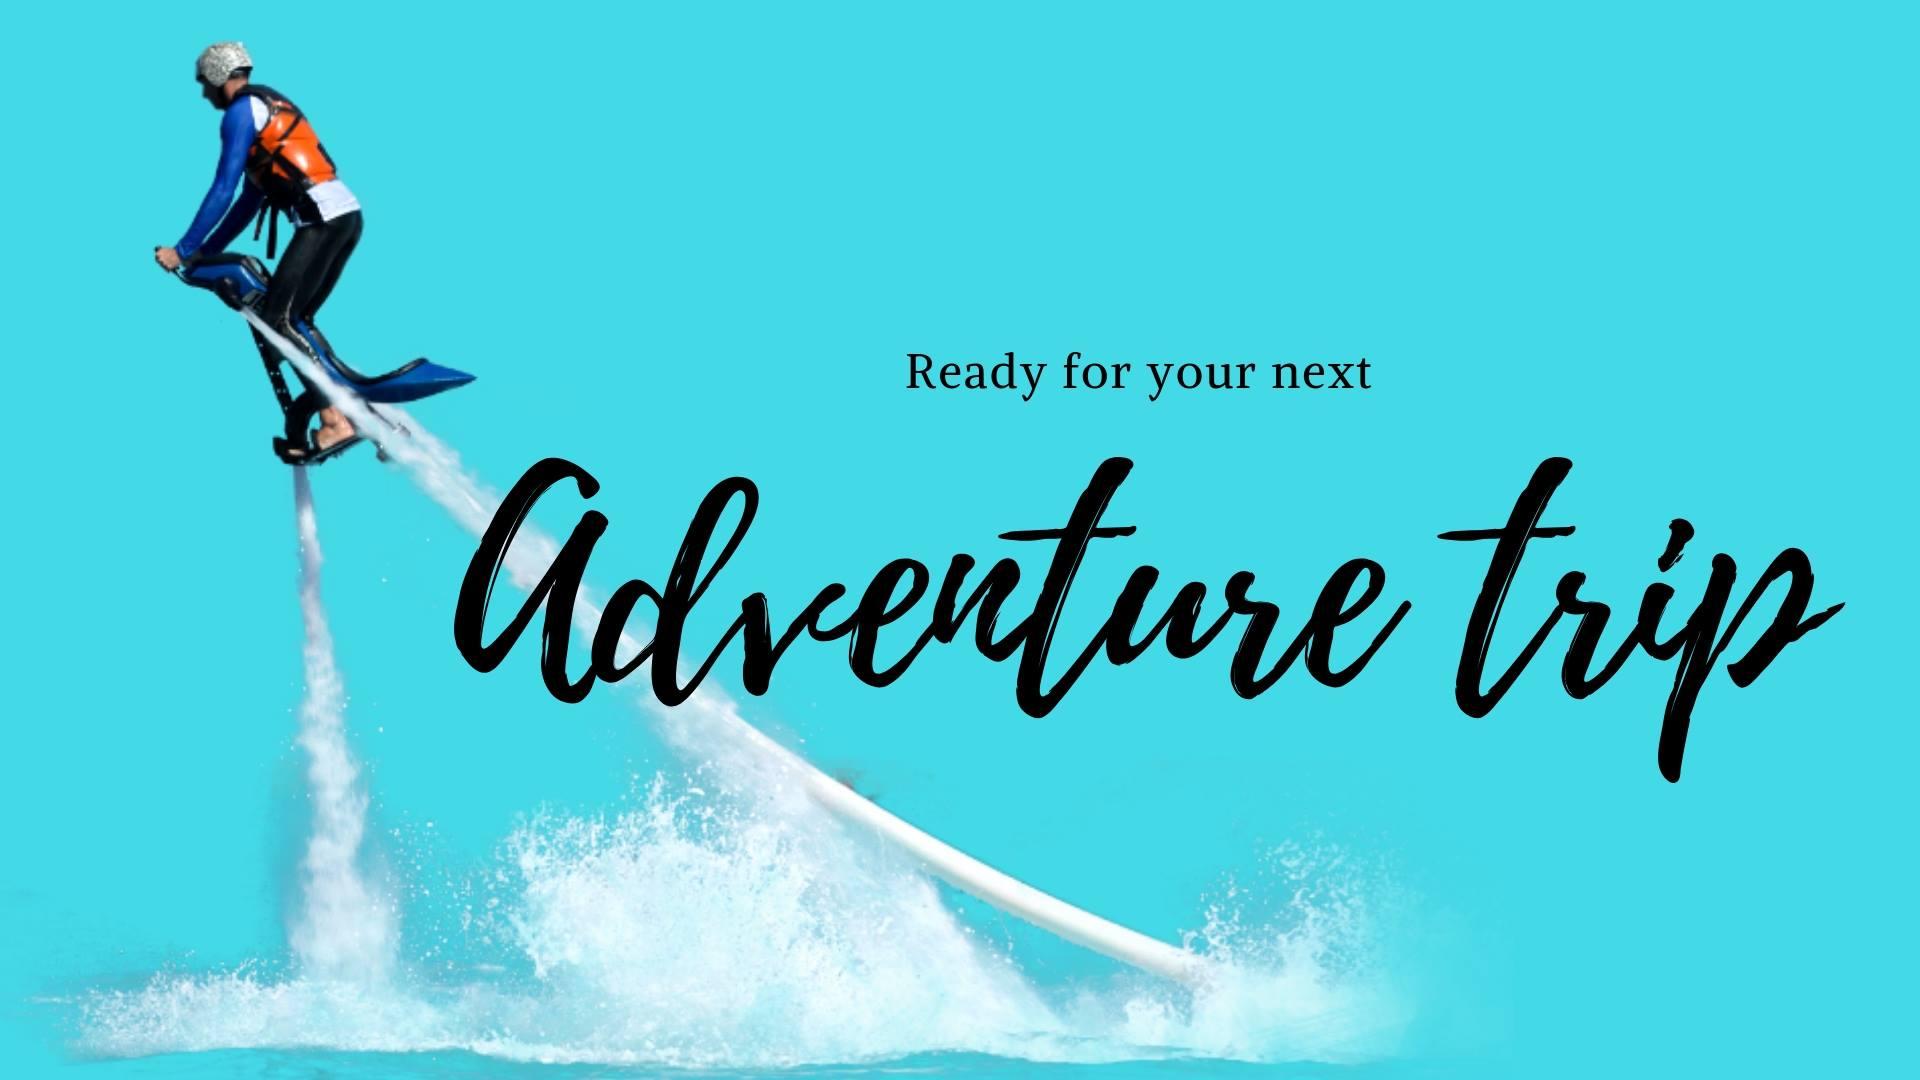 Zapata Flyboard : Best Sports Gadget for Next Adventure Trip